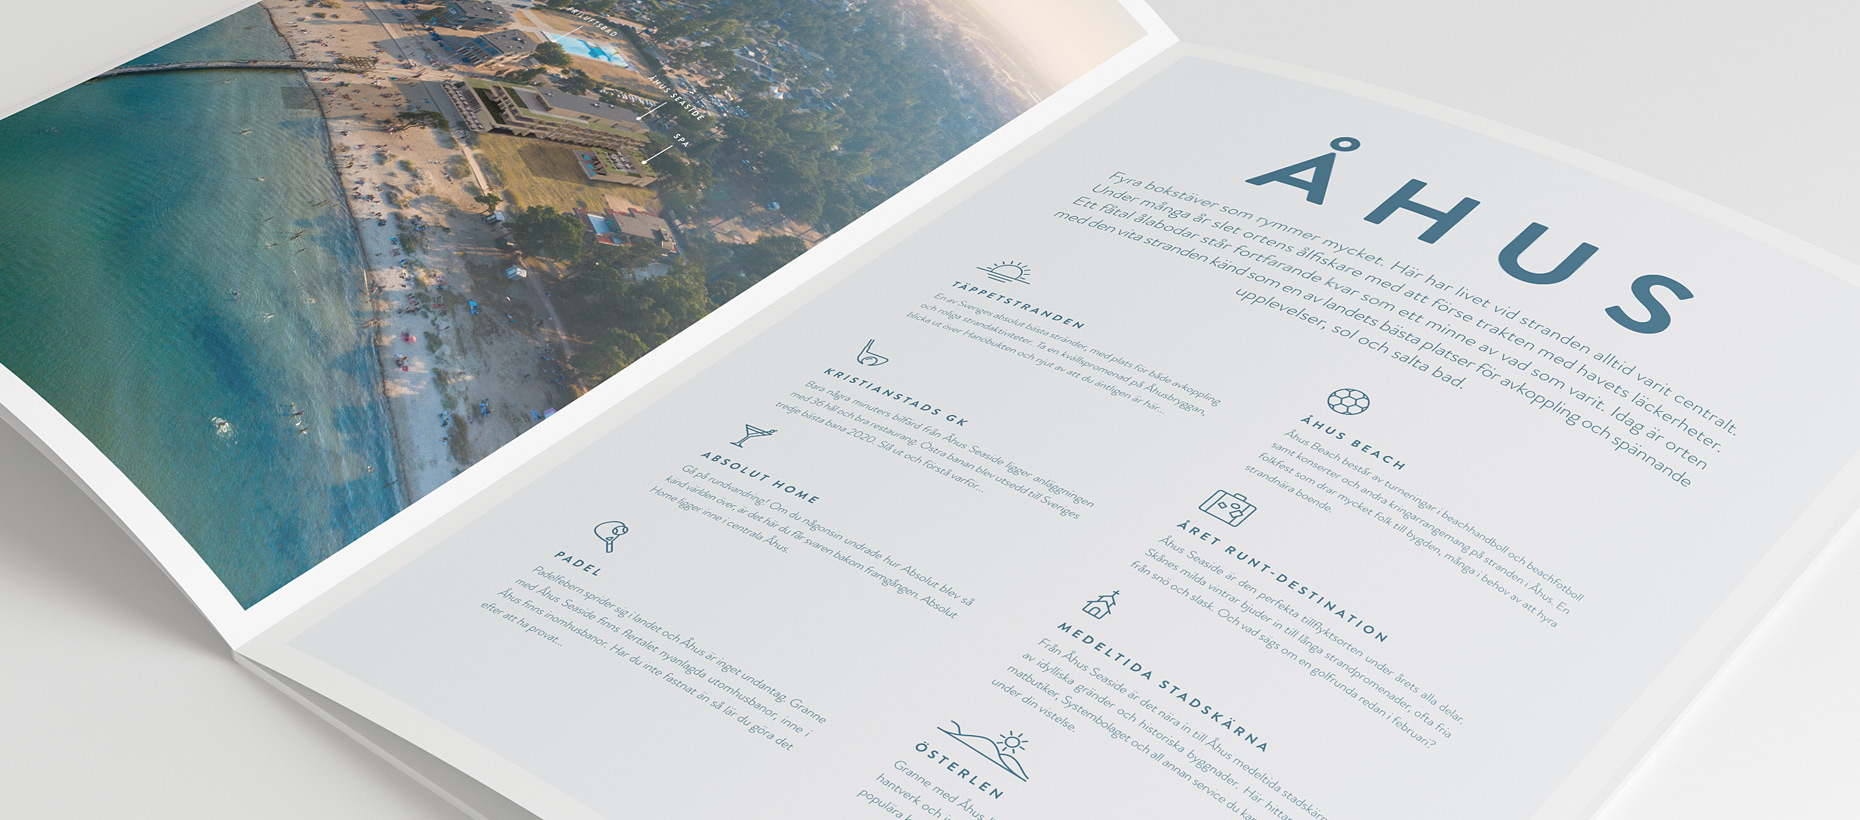 Nya Åhus Seaside broschyr - Bravissimo